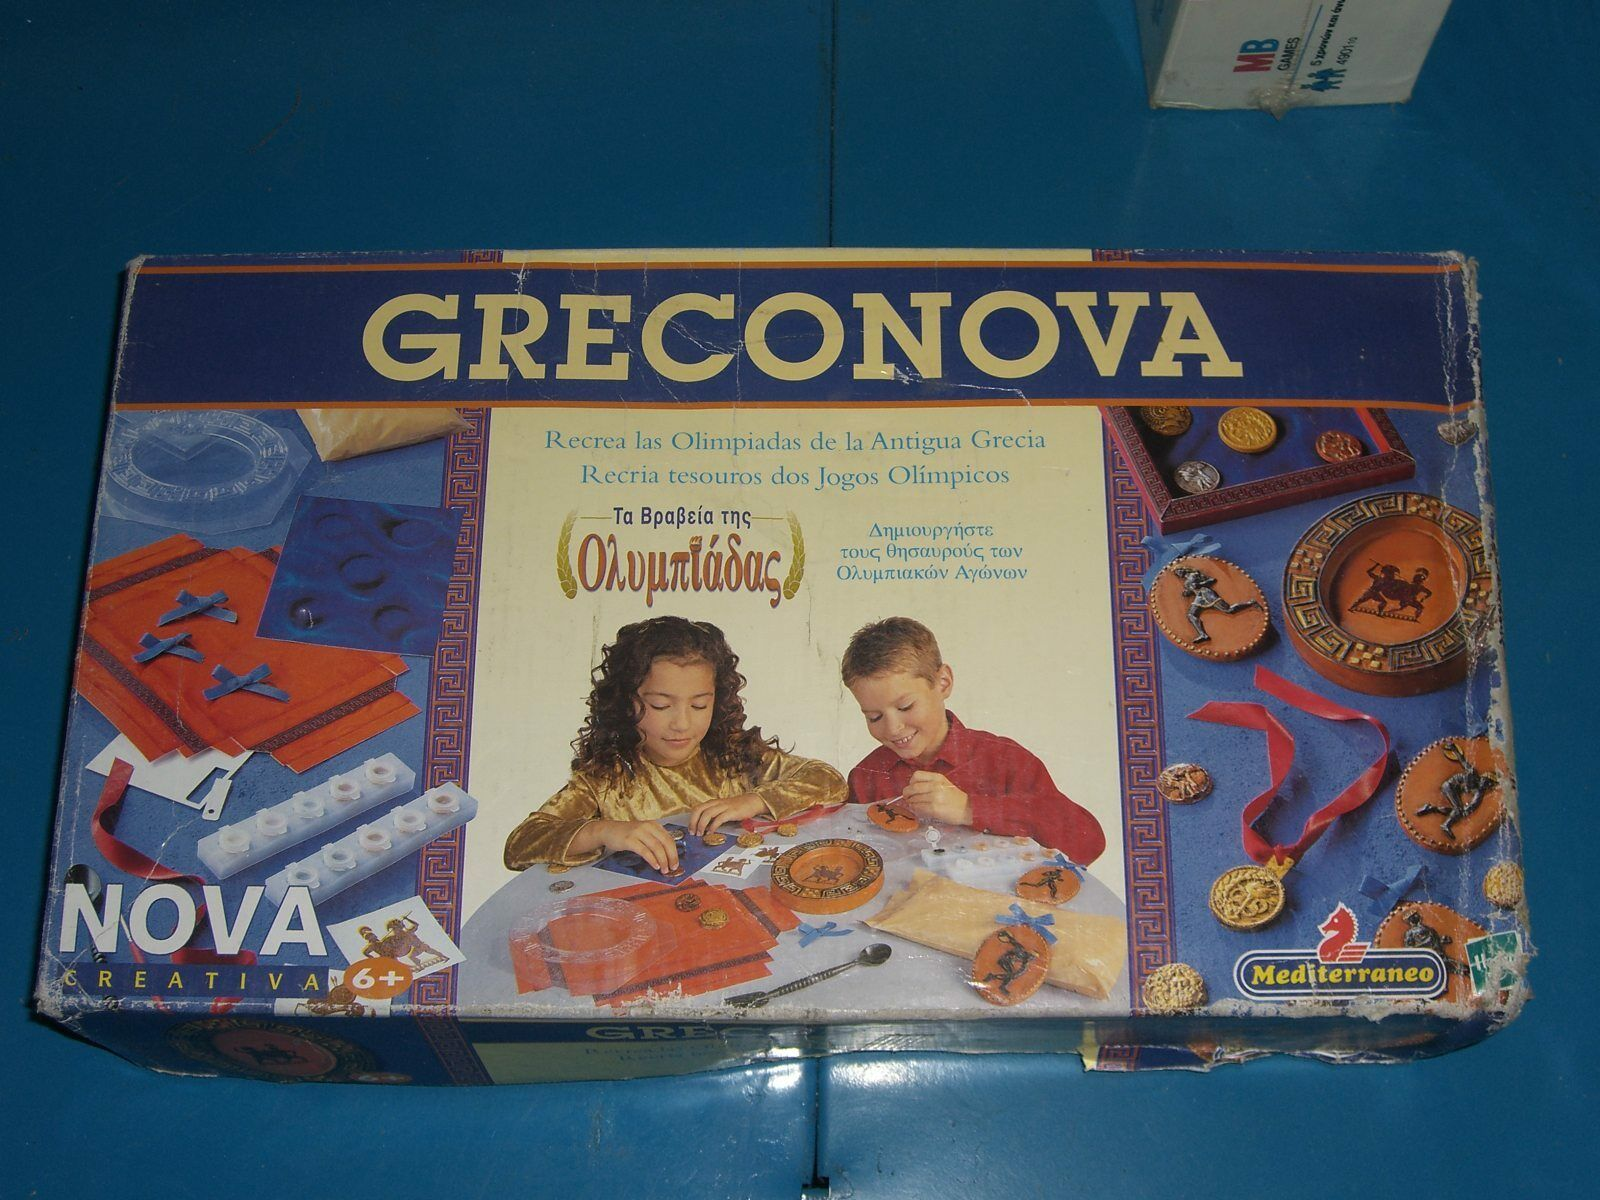 1999 MEDITERRANEO MOLDING SET GRECONOVA HASBRO EDUCATIONAL GREEK OLYMPIC GAMES